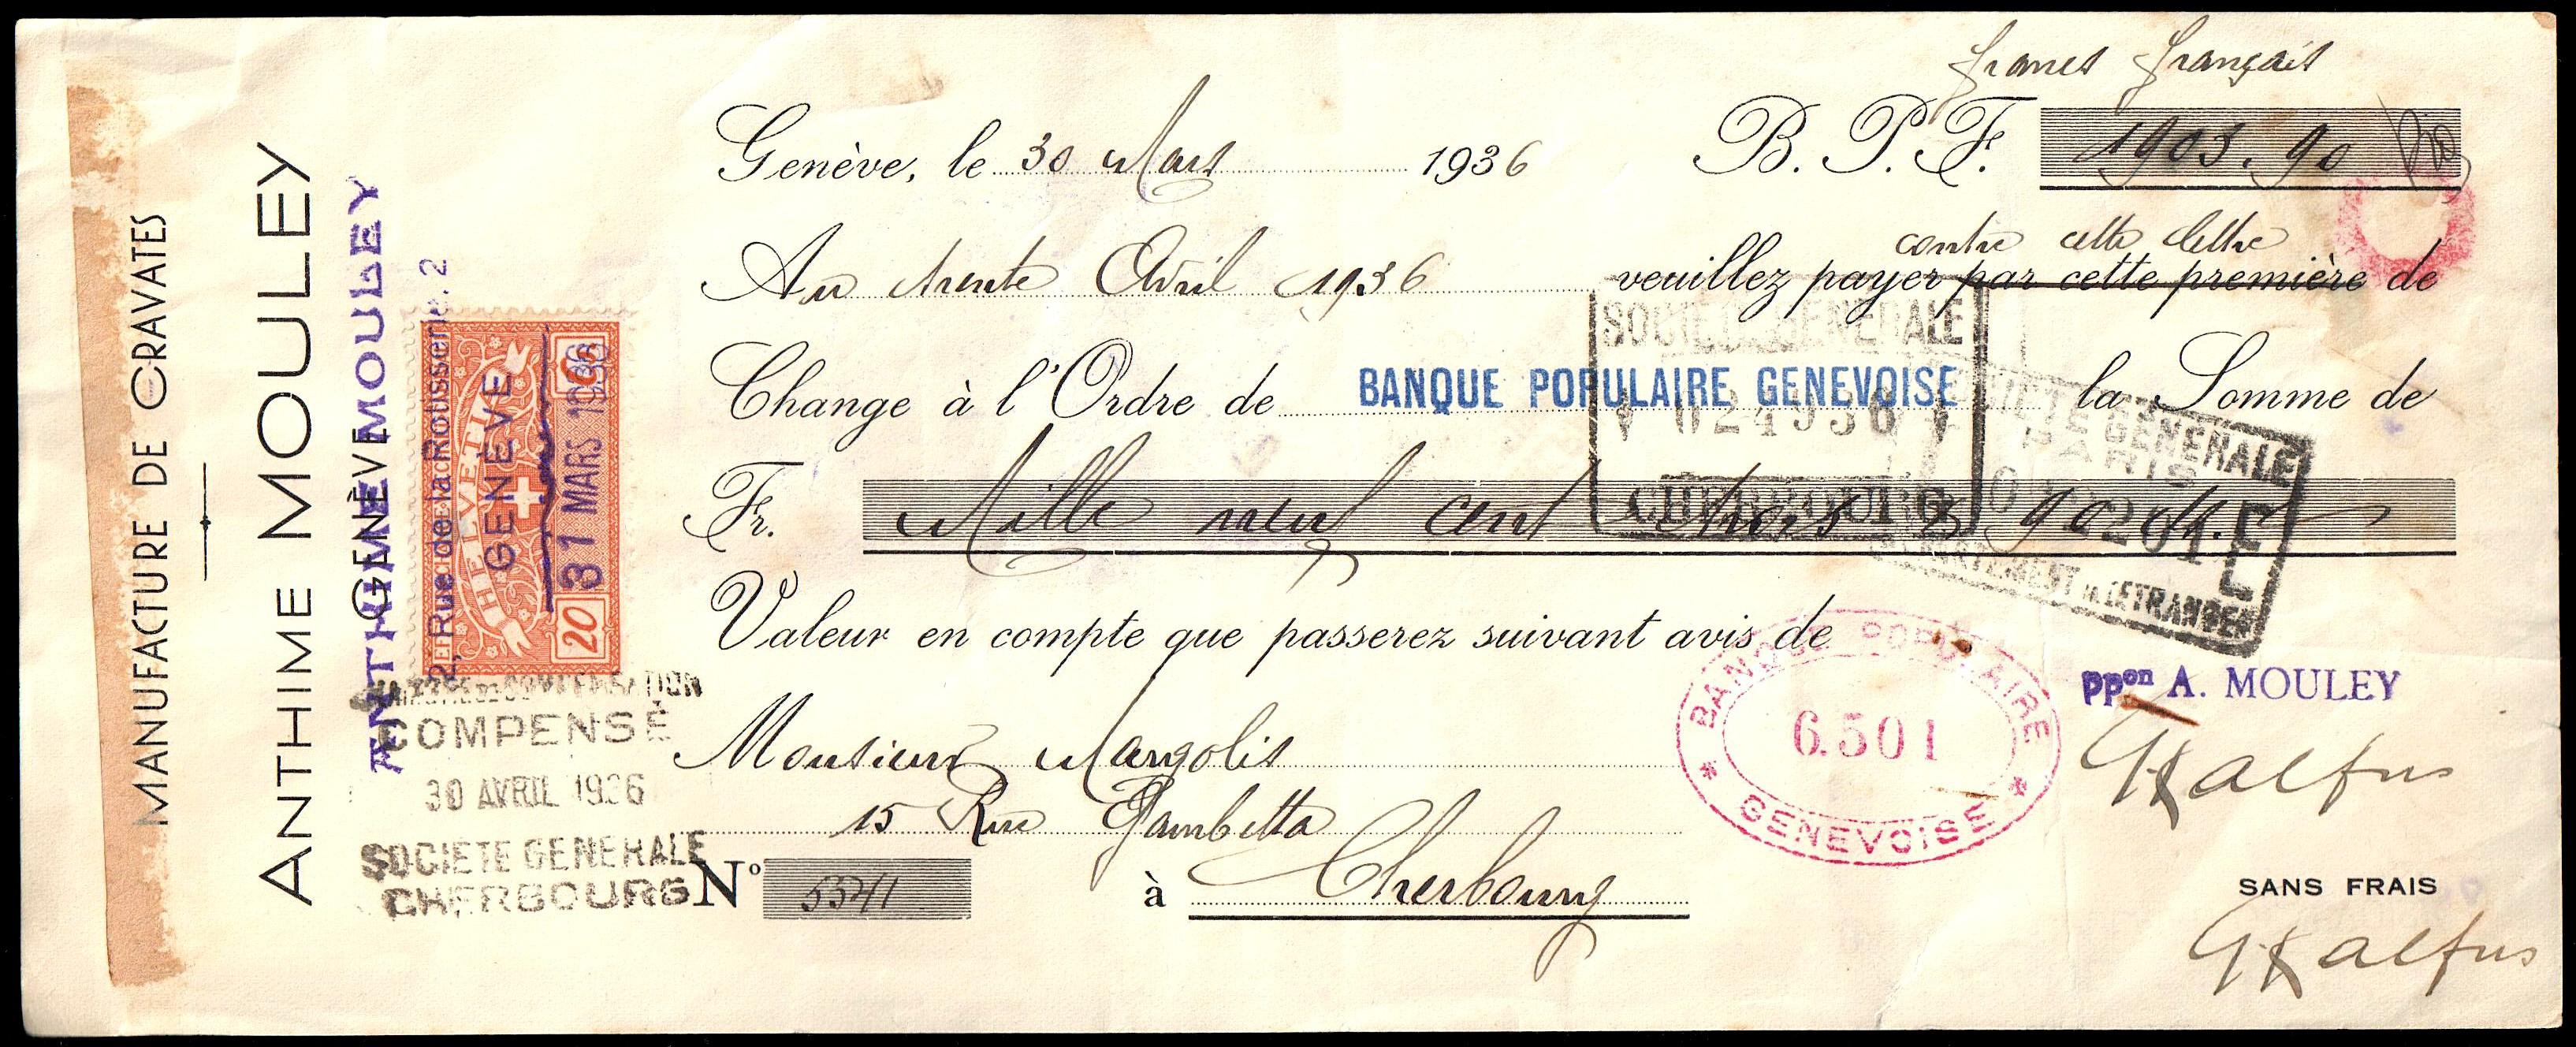 Fileswitzerland 1936 03 31 bill of exchange anthime mouleyg fileswitzerland 1936 03 31 bill of exchange anthime mouleyg thecheapjerseys Gallery